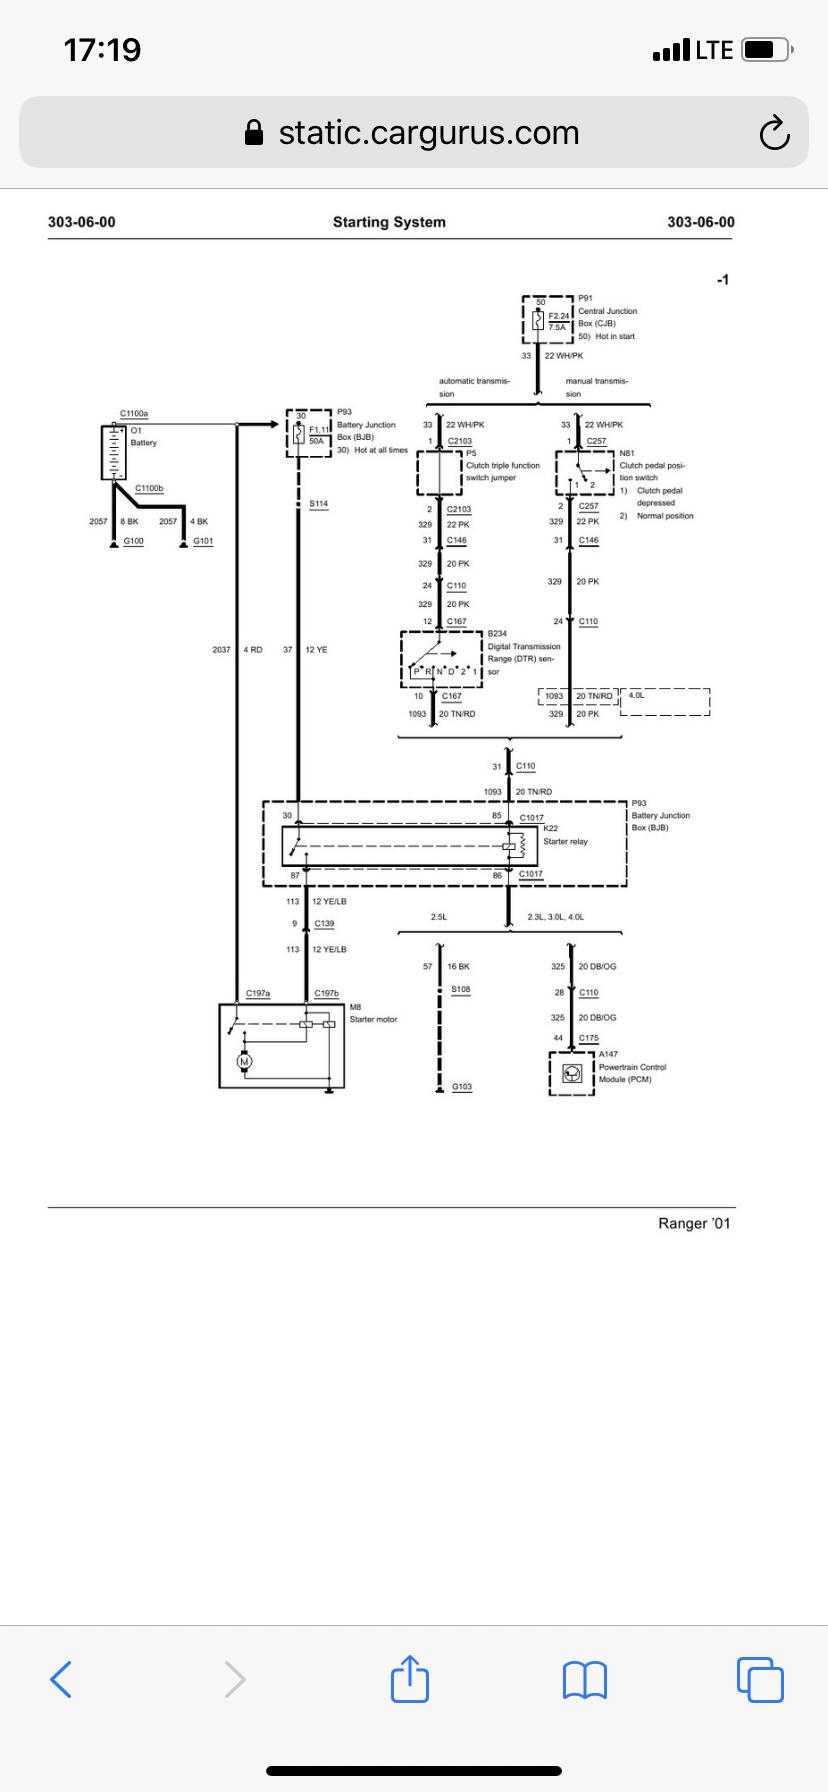 M5od-r1 Or R1hd Transmission Harness Part